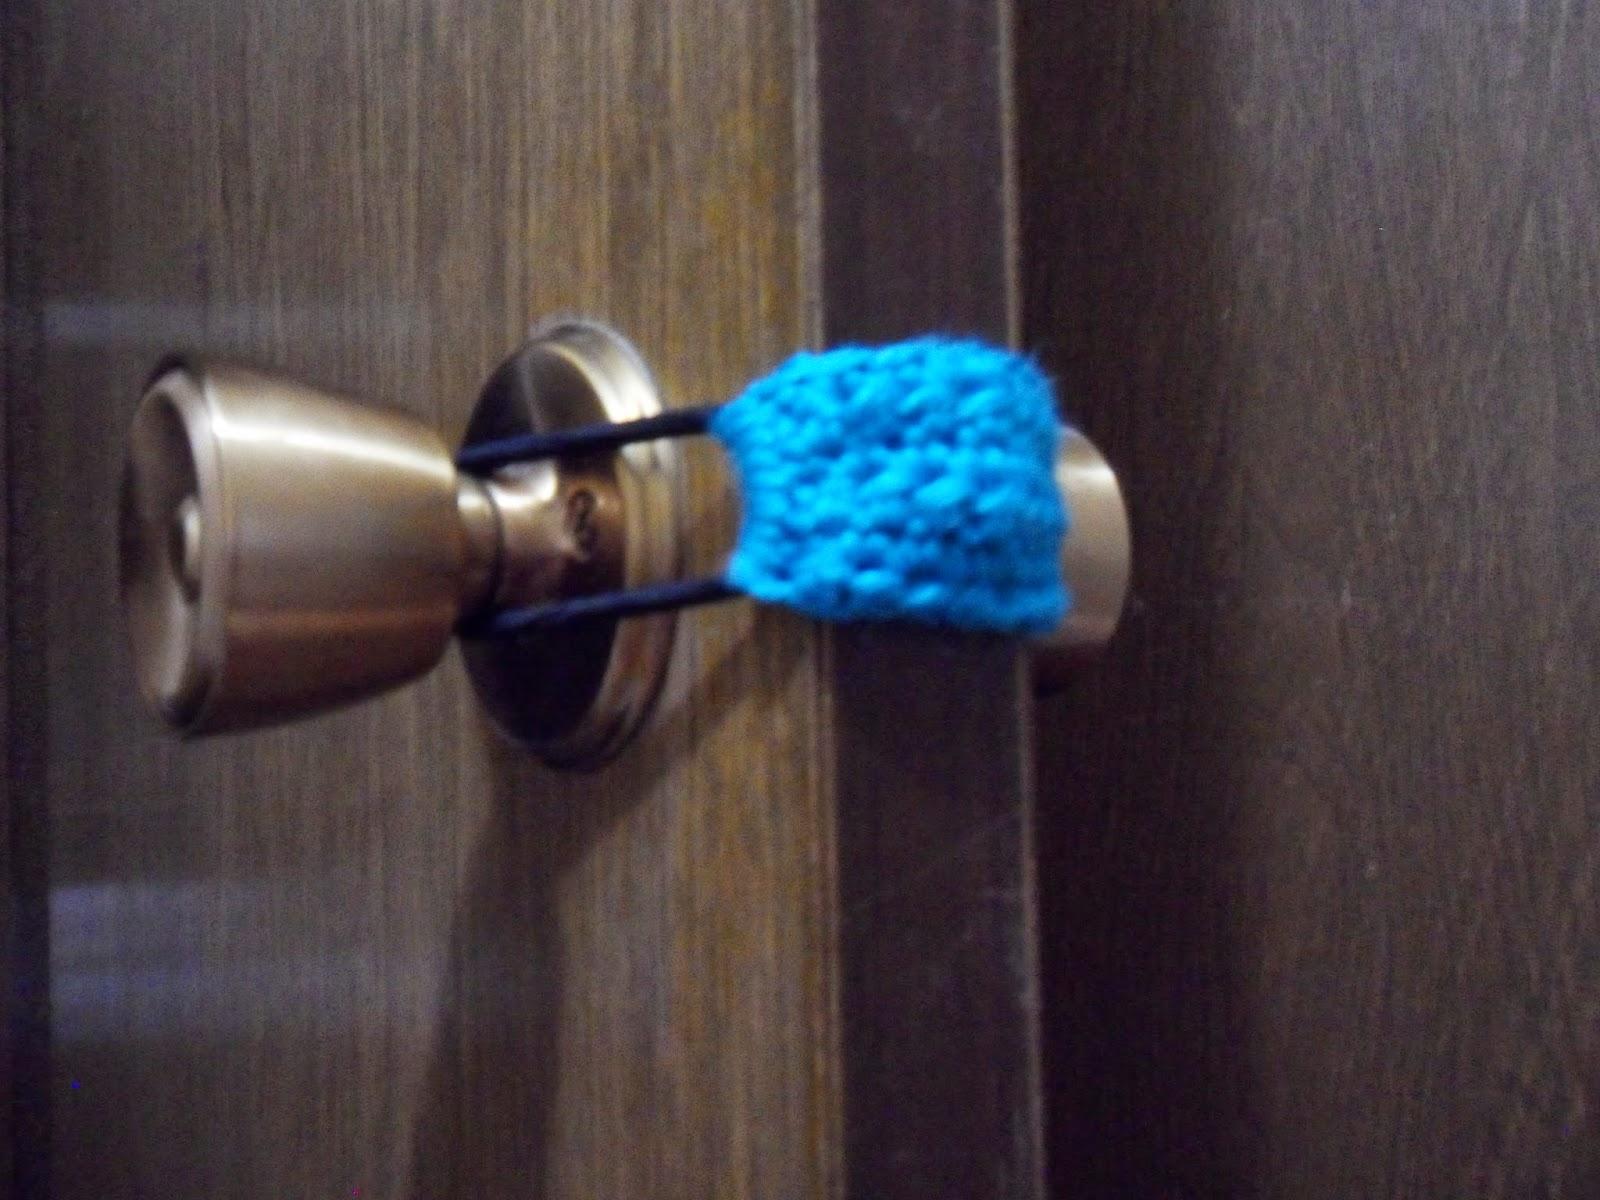 10 Minute Door Shusher/Cozy by Manda Proell of MandaLynn's Crochet Treasures